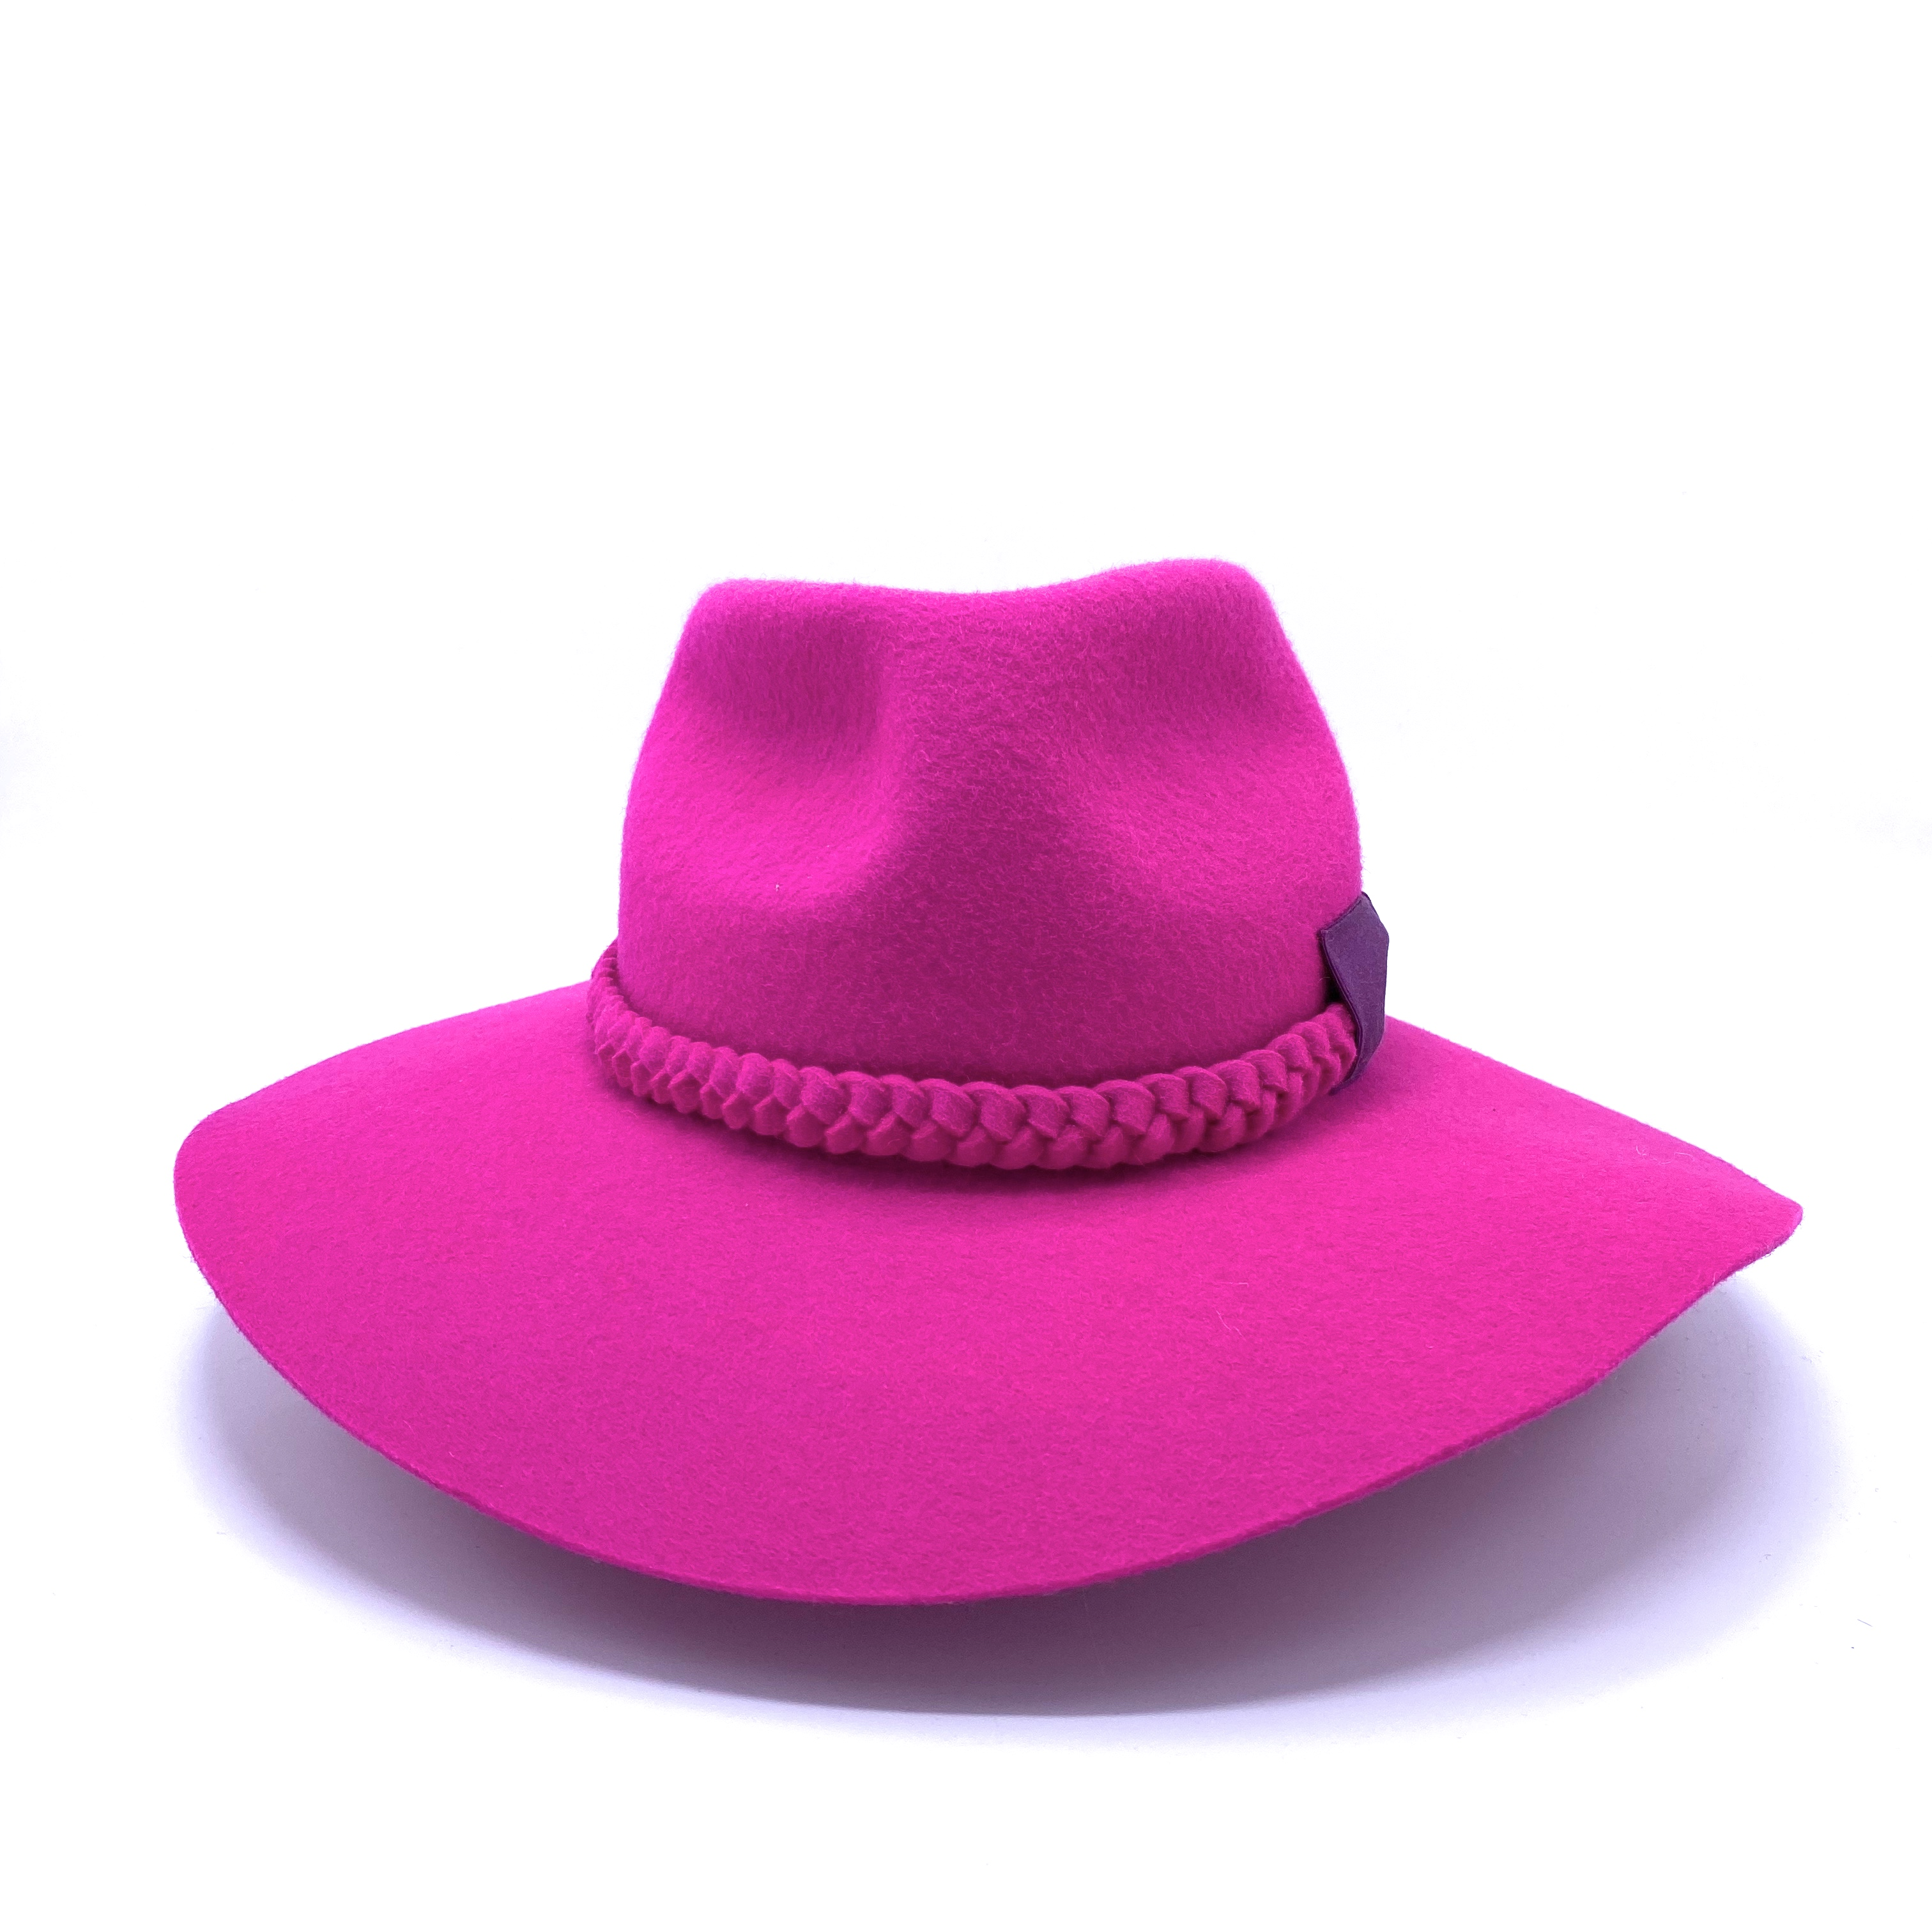 Per Brink Fedora Pink